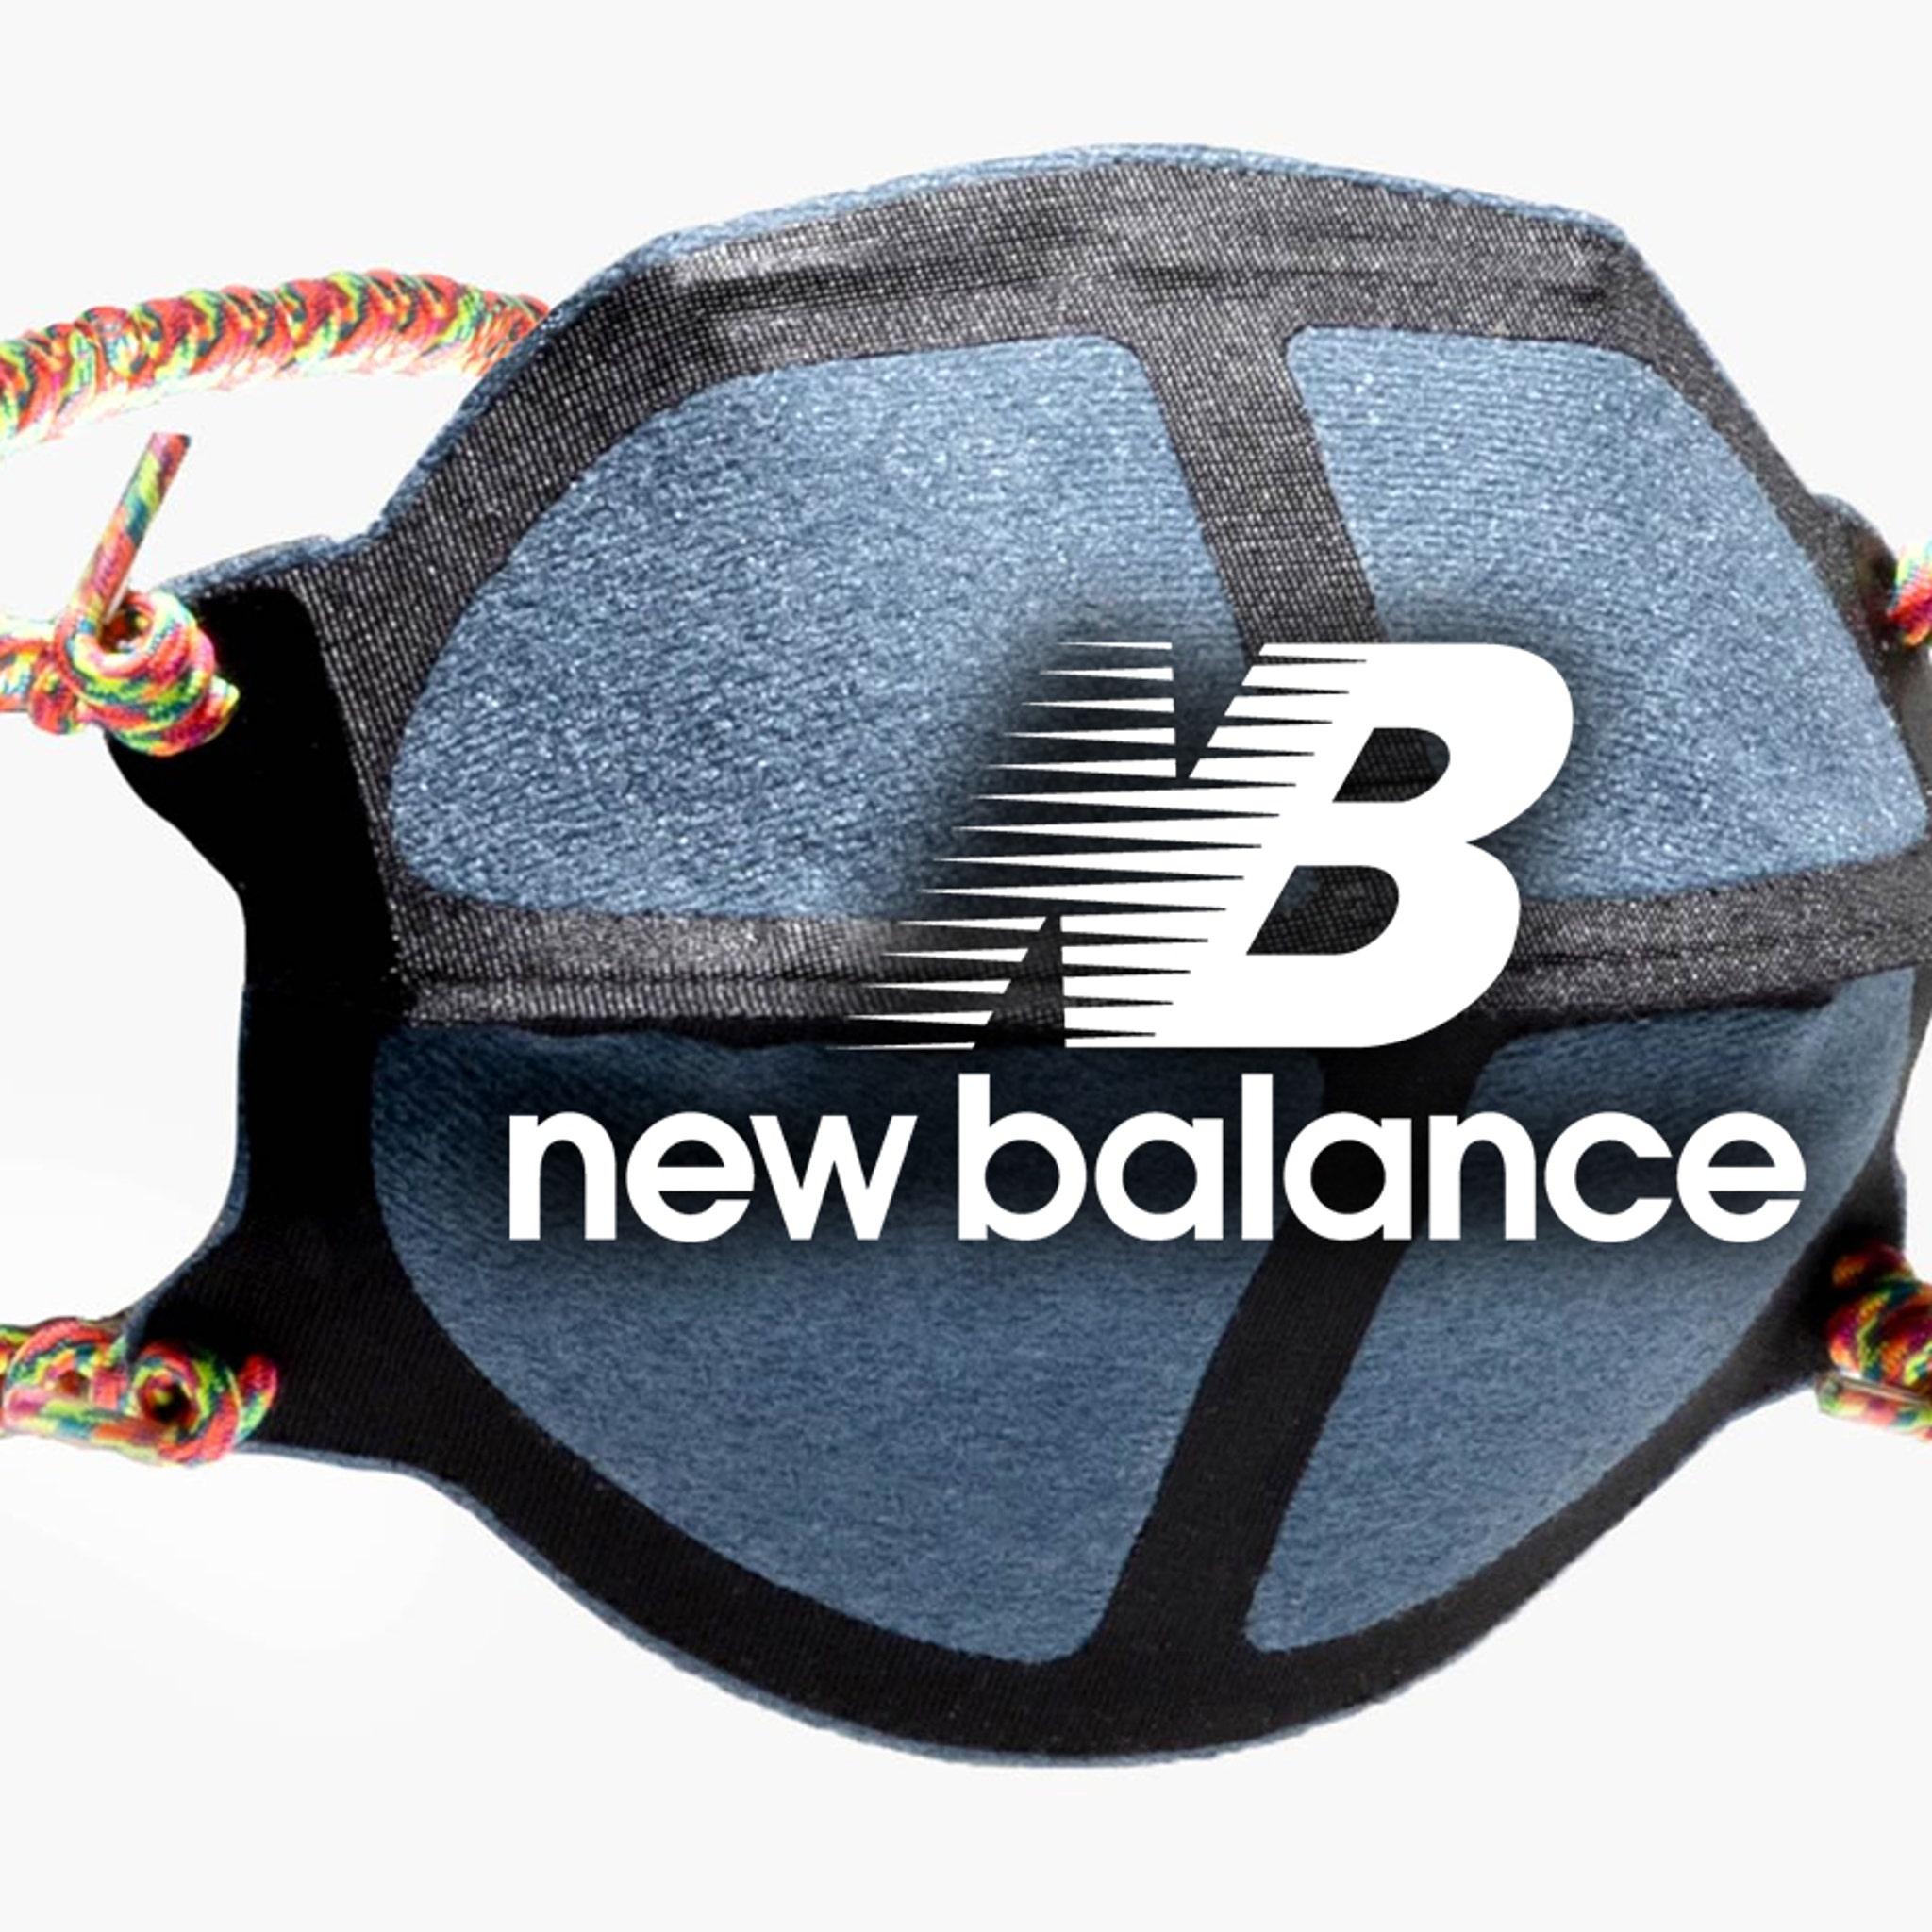 new balance pin